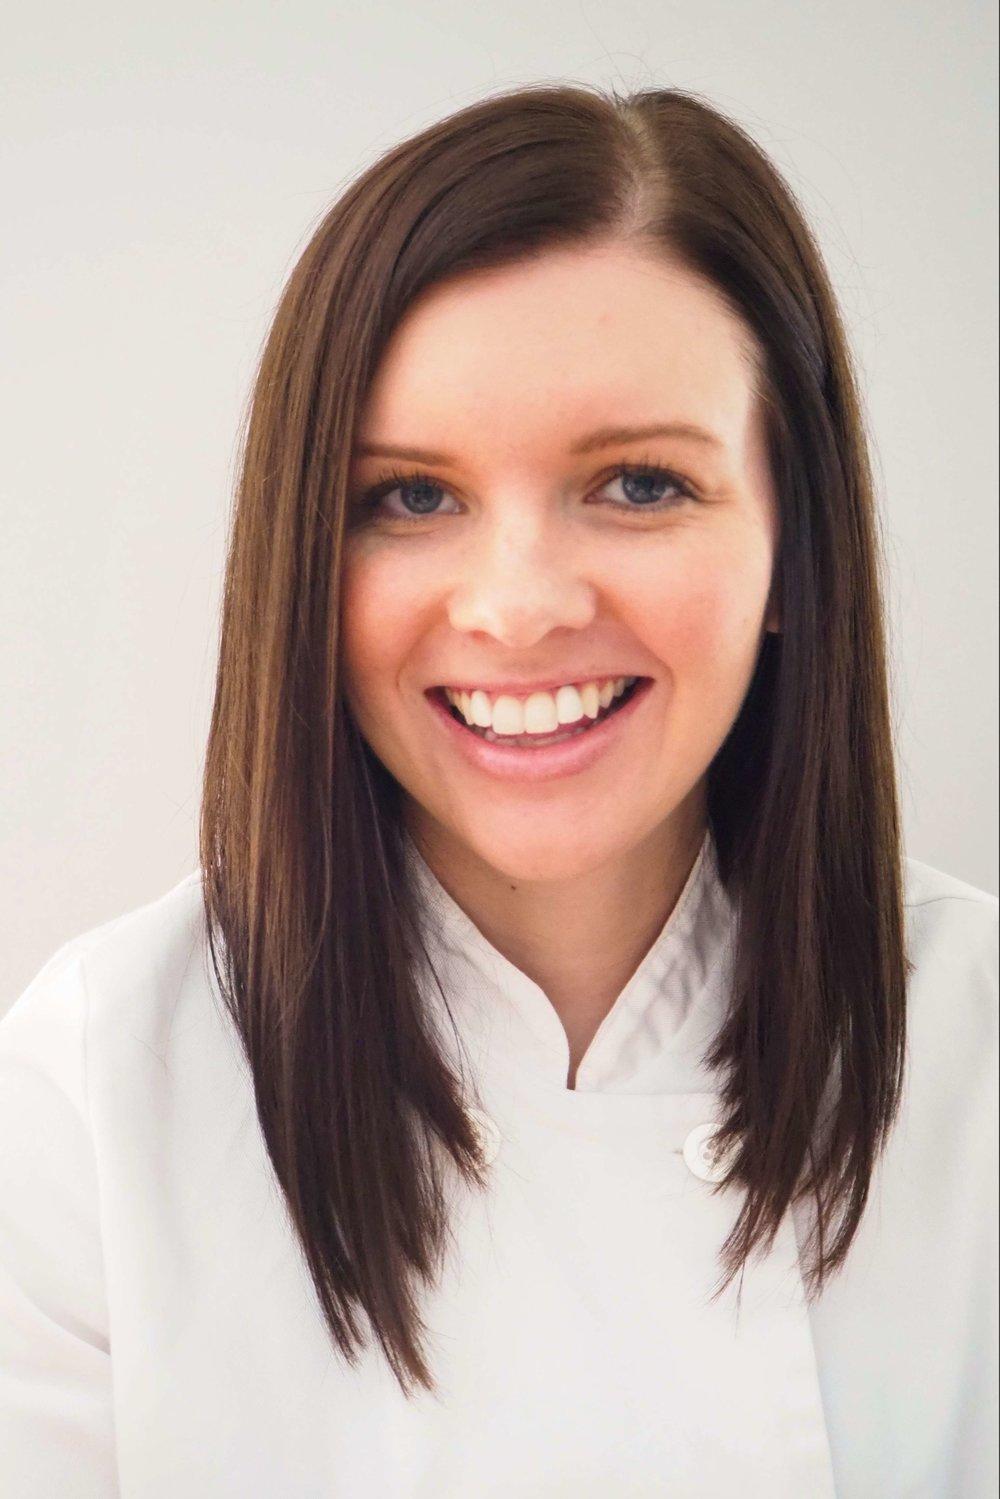 Cake Designer Heather Jurisch   Enticing Icing, Minneapolis/St. Paul, MN